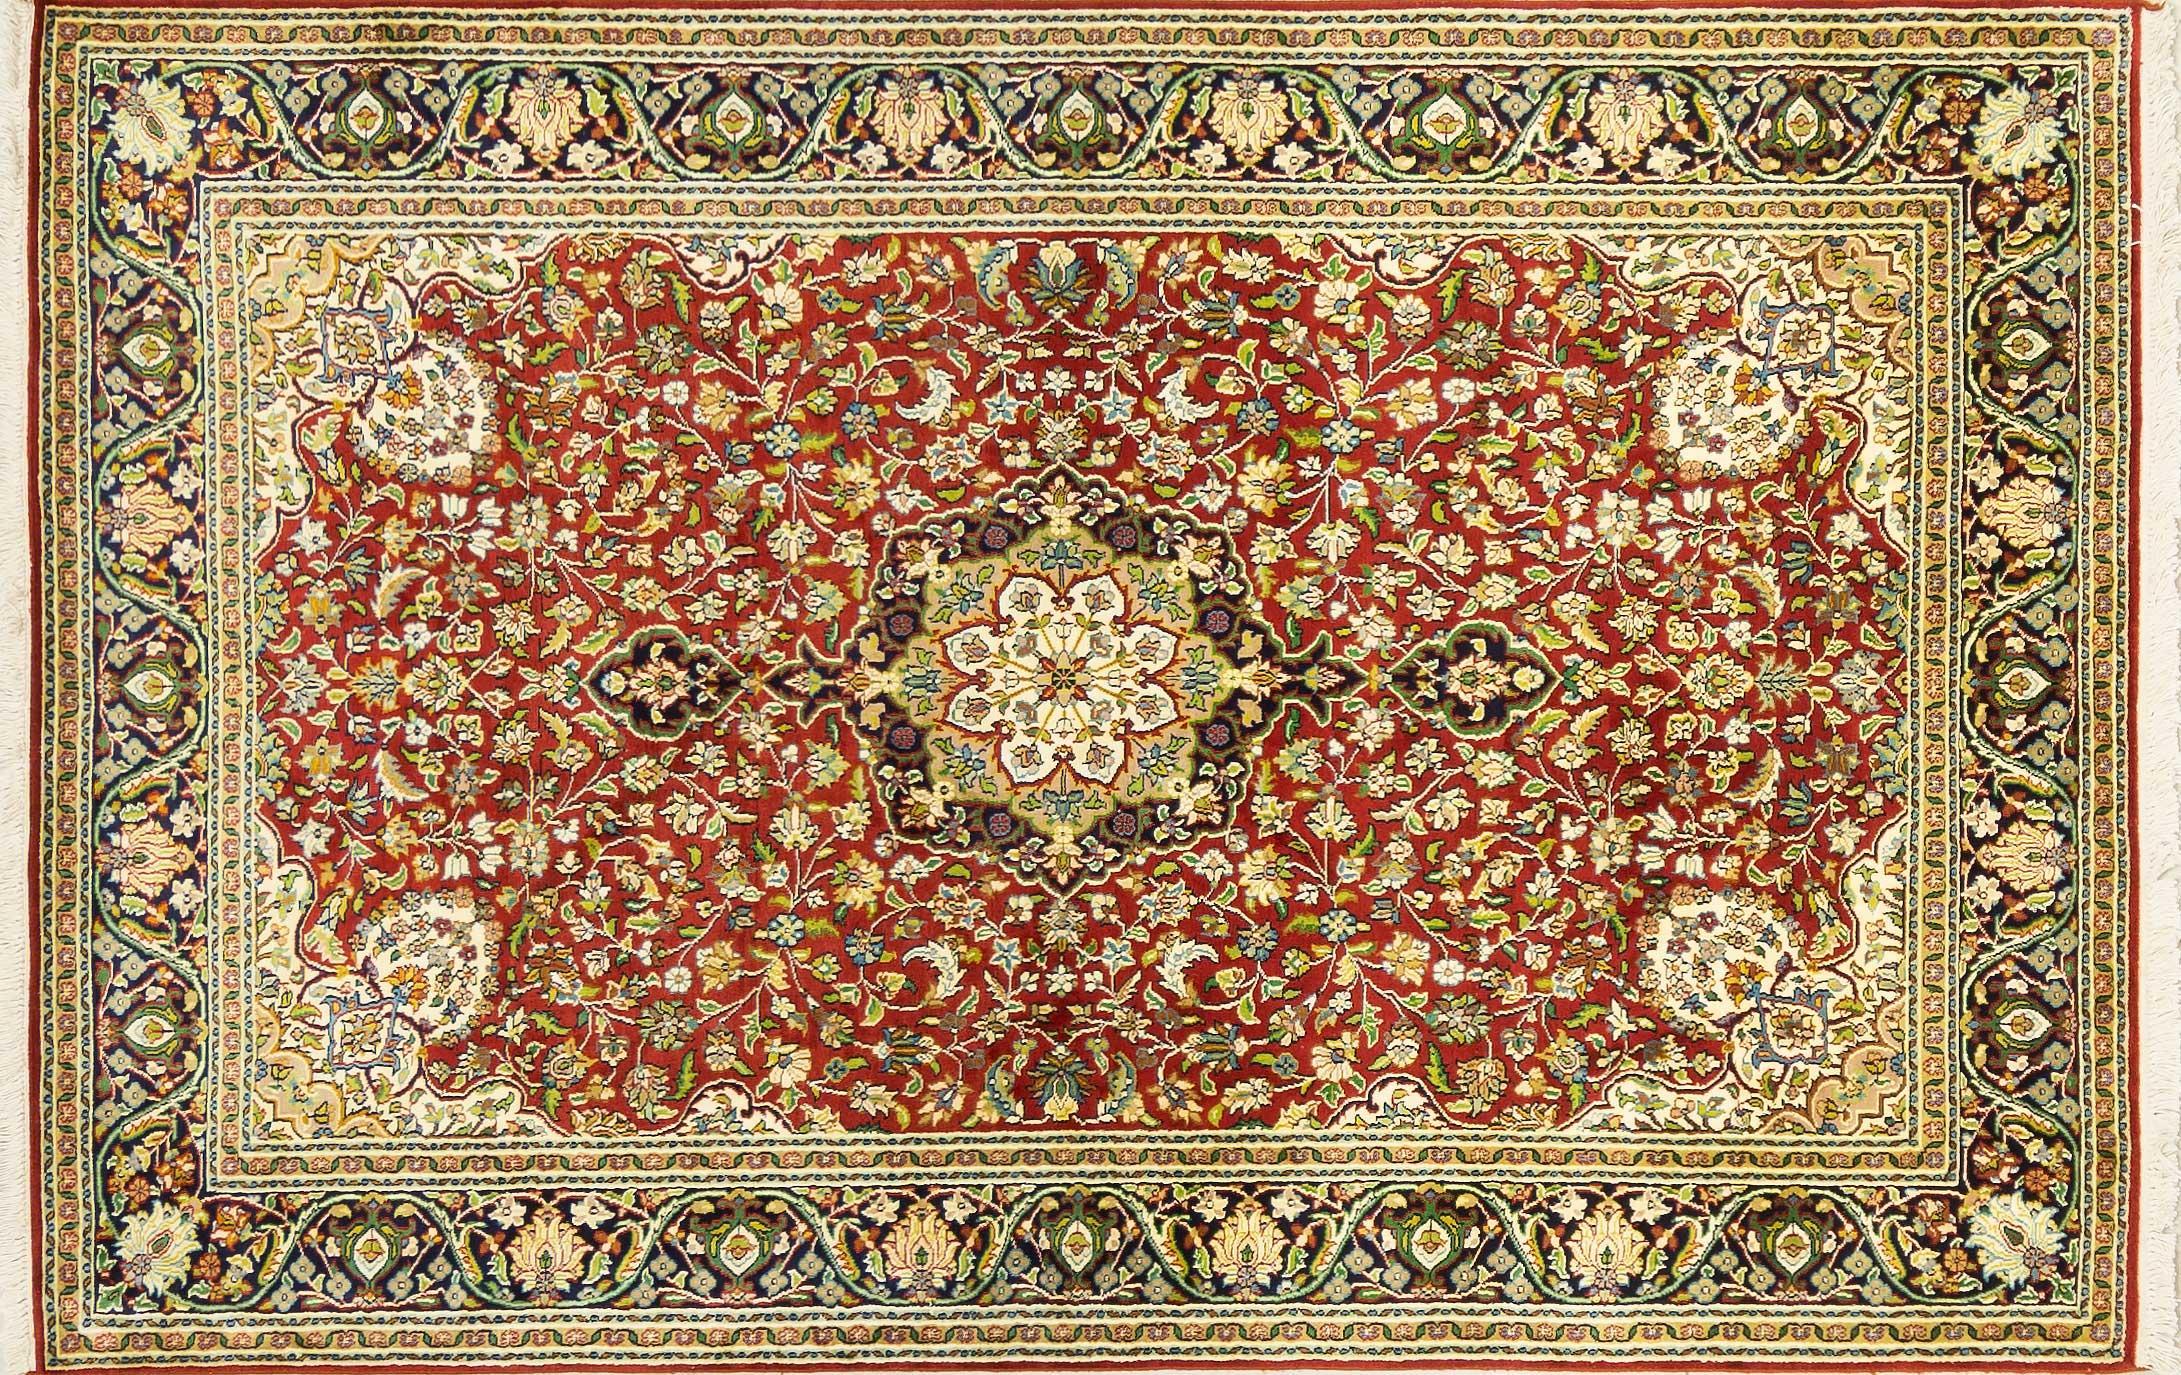 A Hand Knotted Silk Keshmiri Rug, 190 x 120